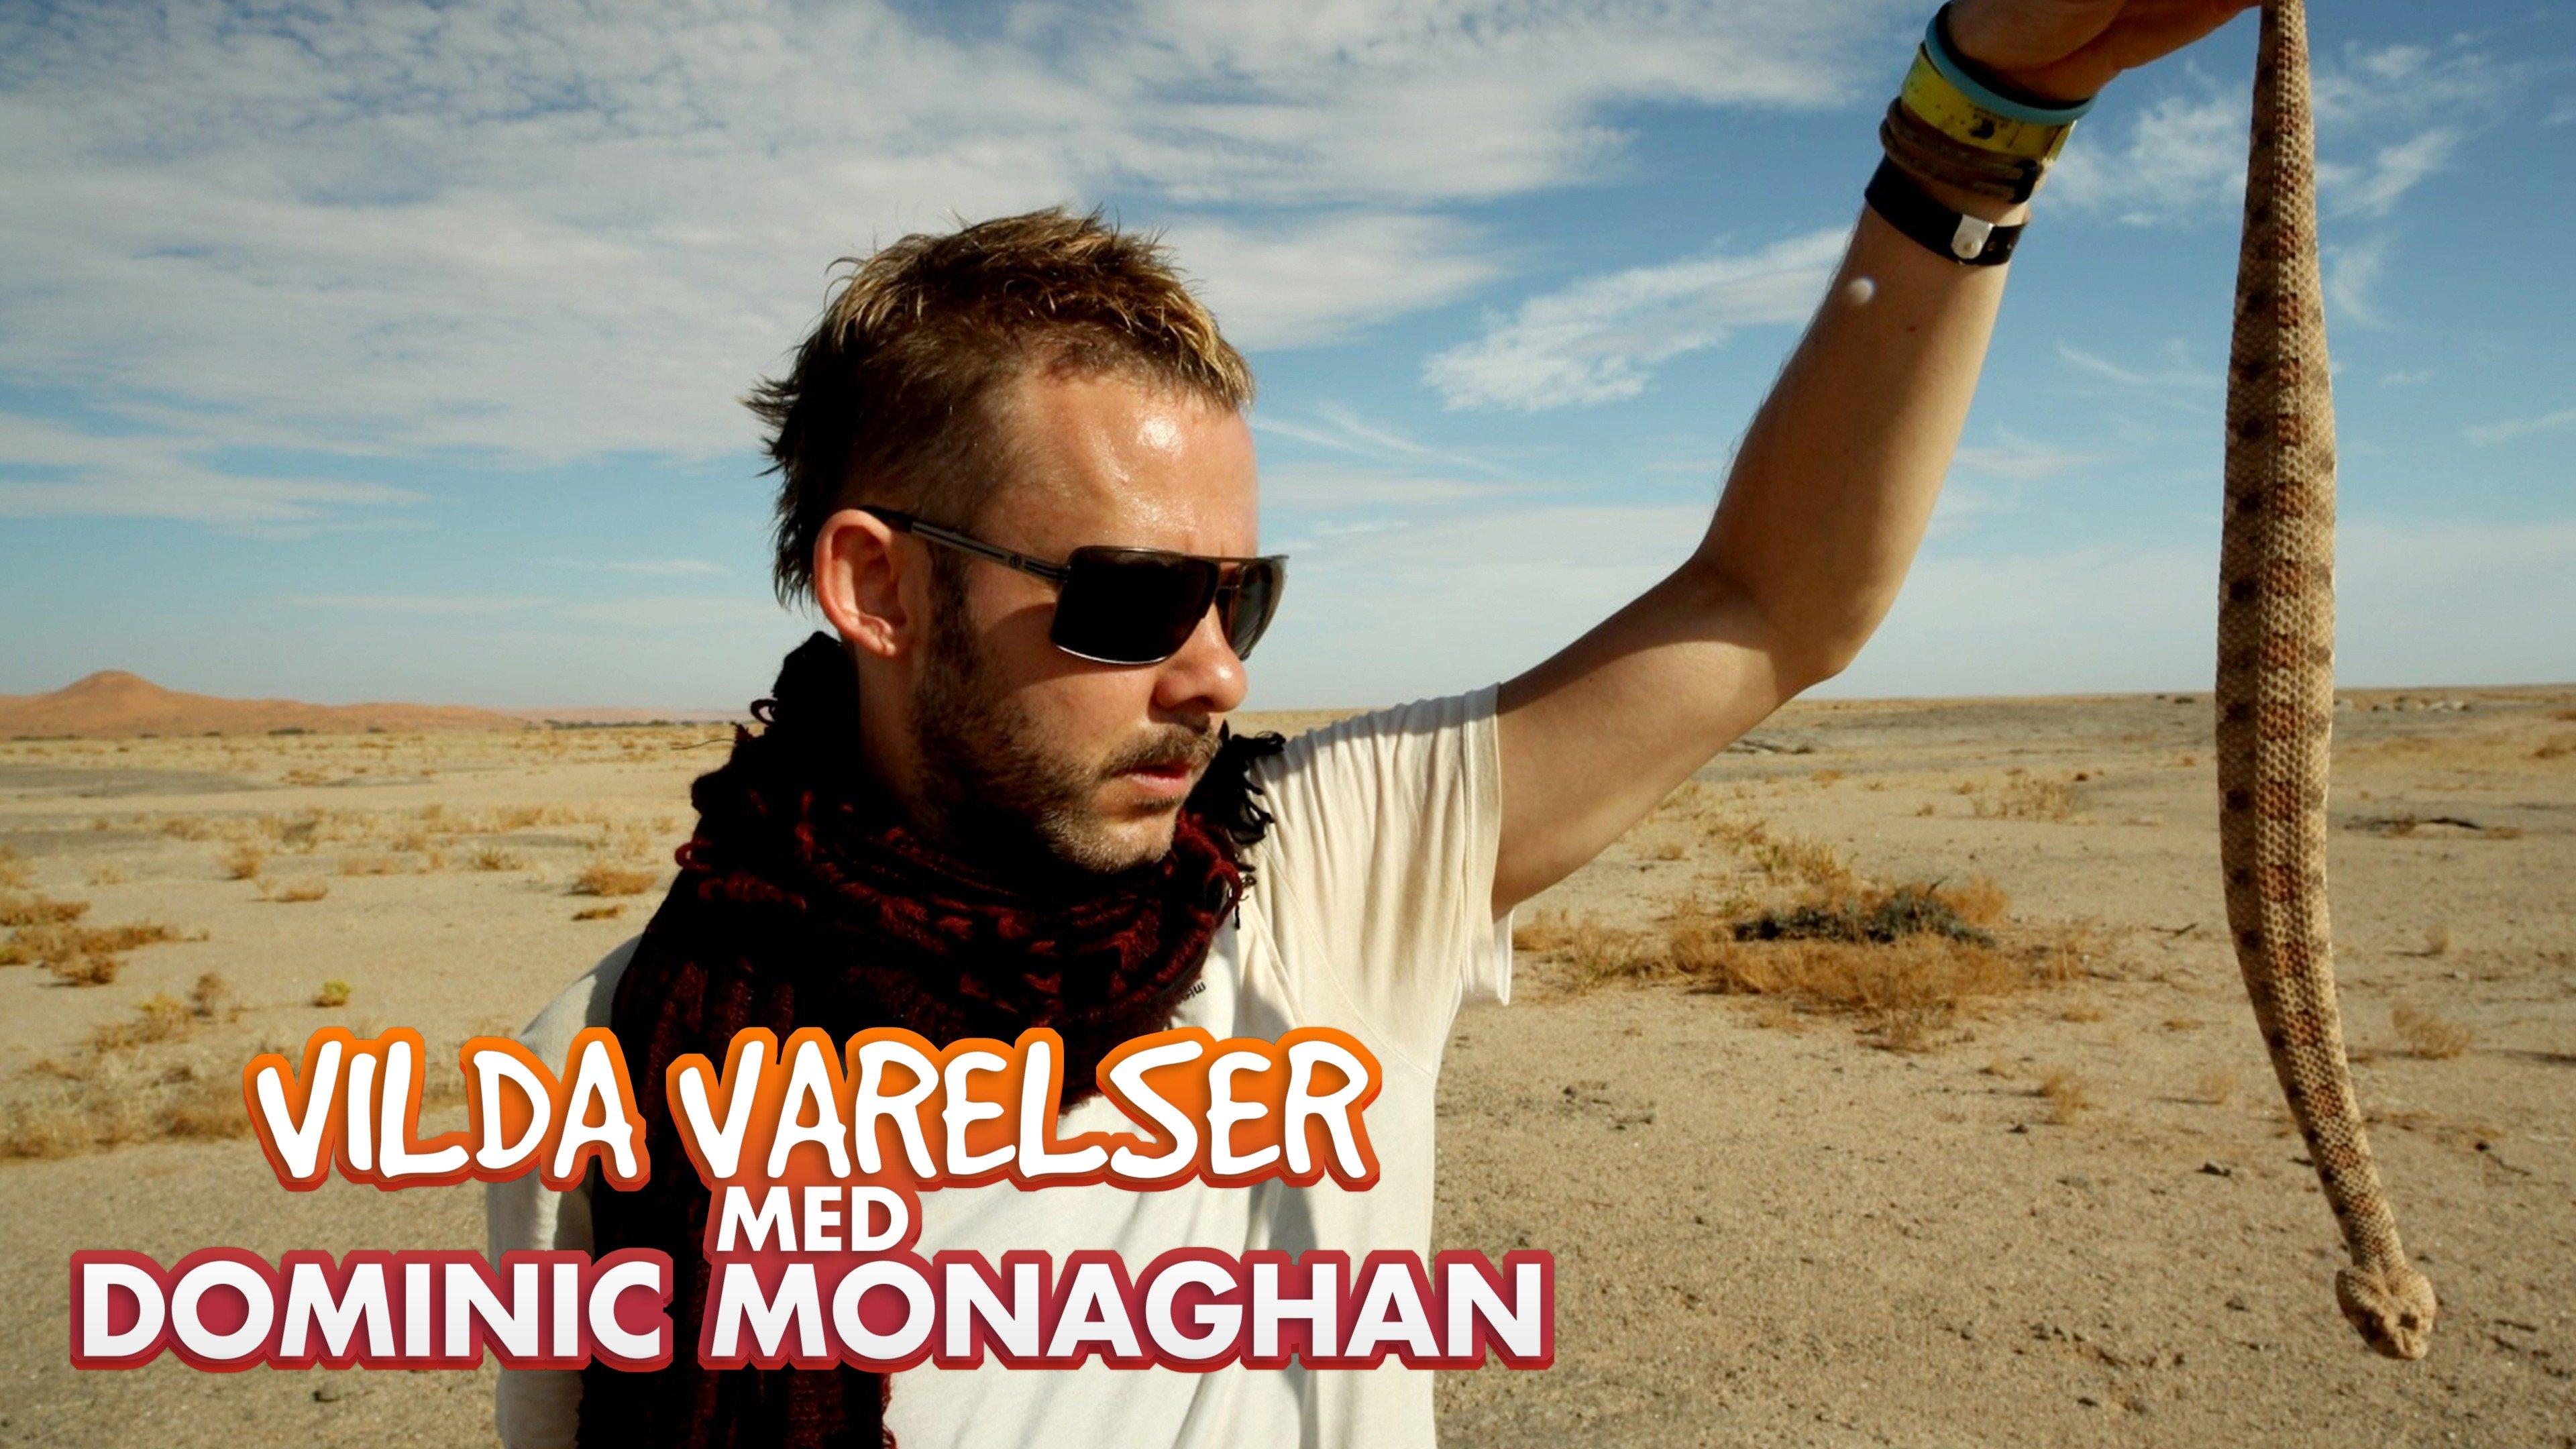 Vilda varelser med Dominic Monaghan